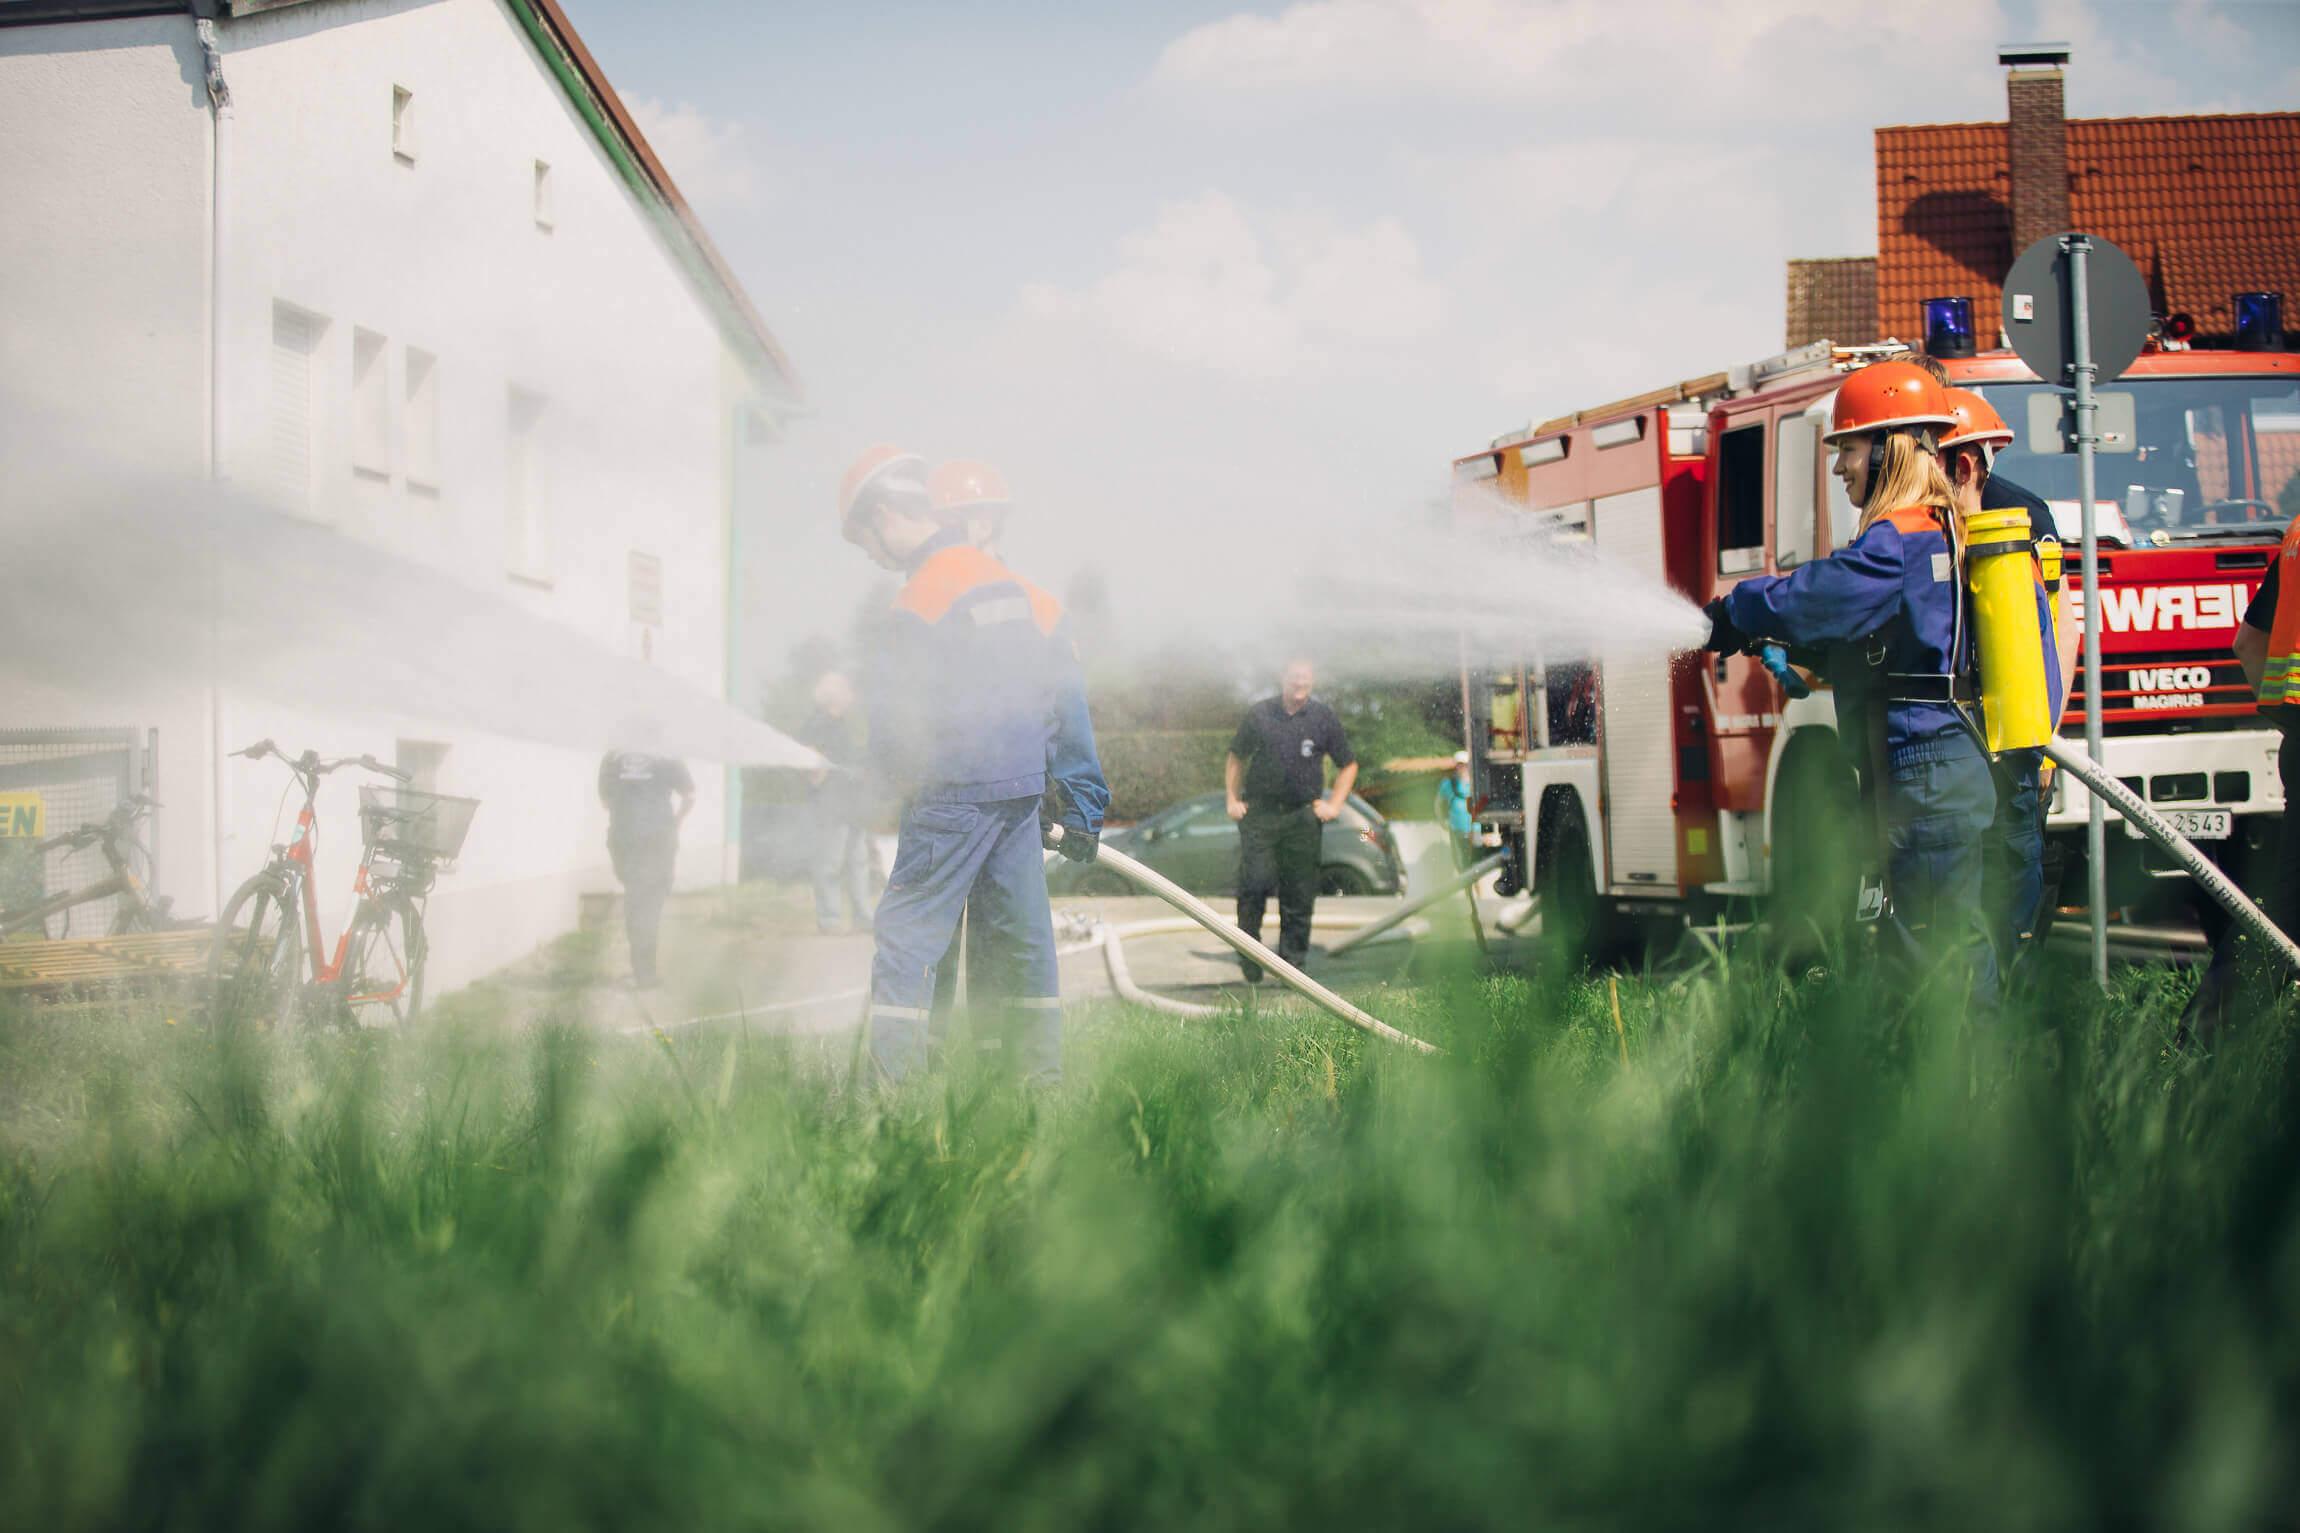 Jugendfeuerwehr Koenigstaedten Jahresanfangsuebung2018 2